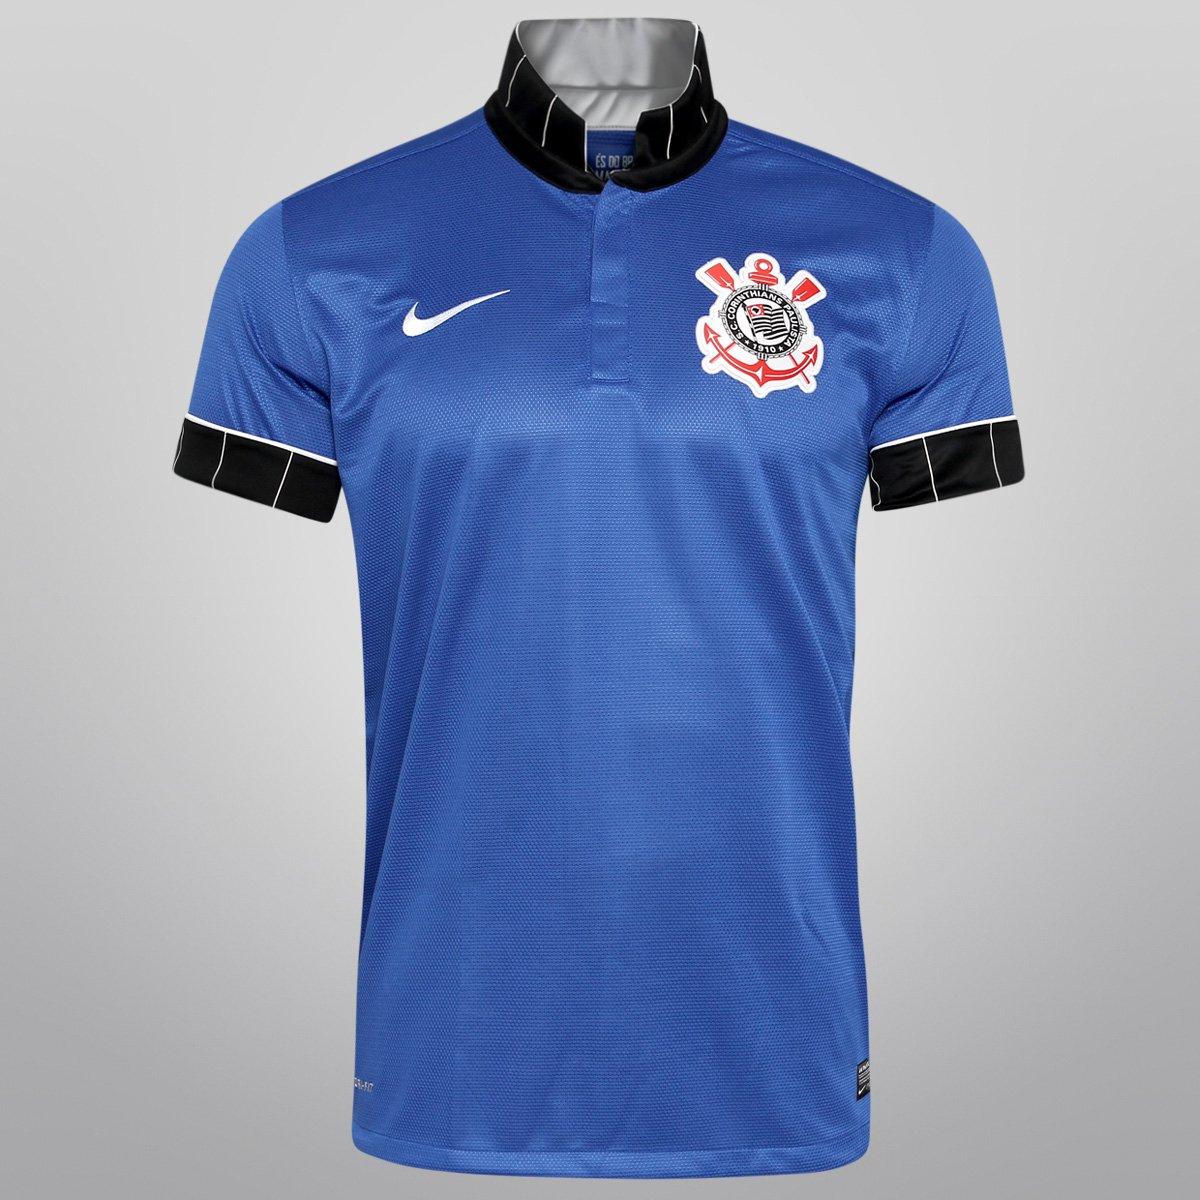 27de0a82231a0 Camisa Nike Corinthians III 13 14 s nº - Compre Agora